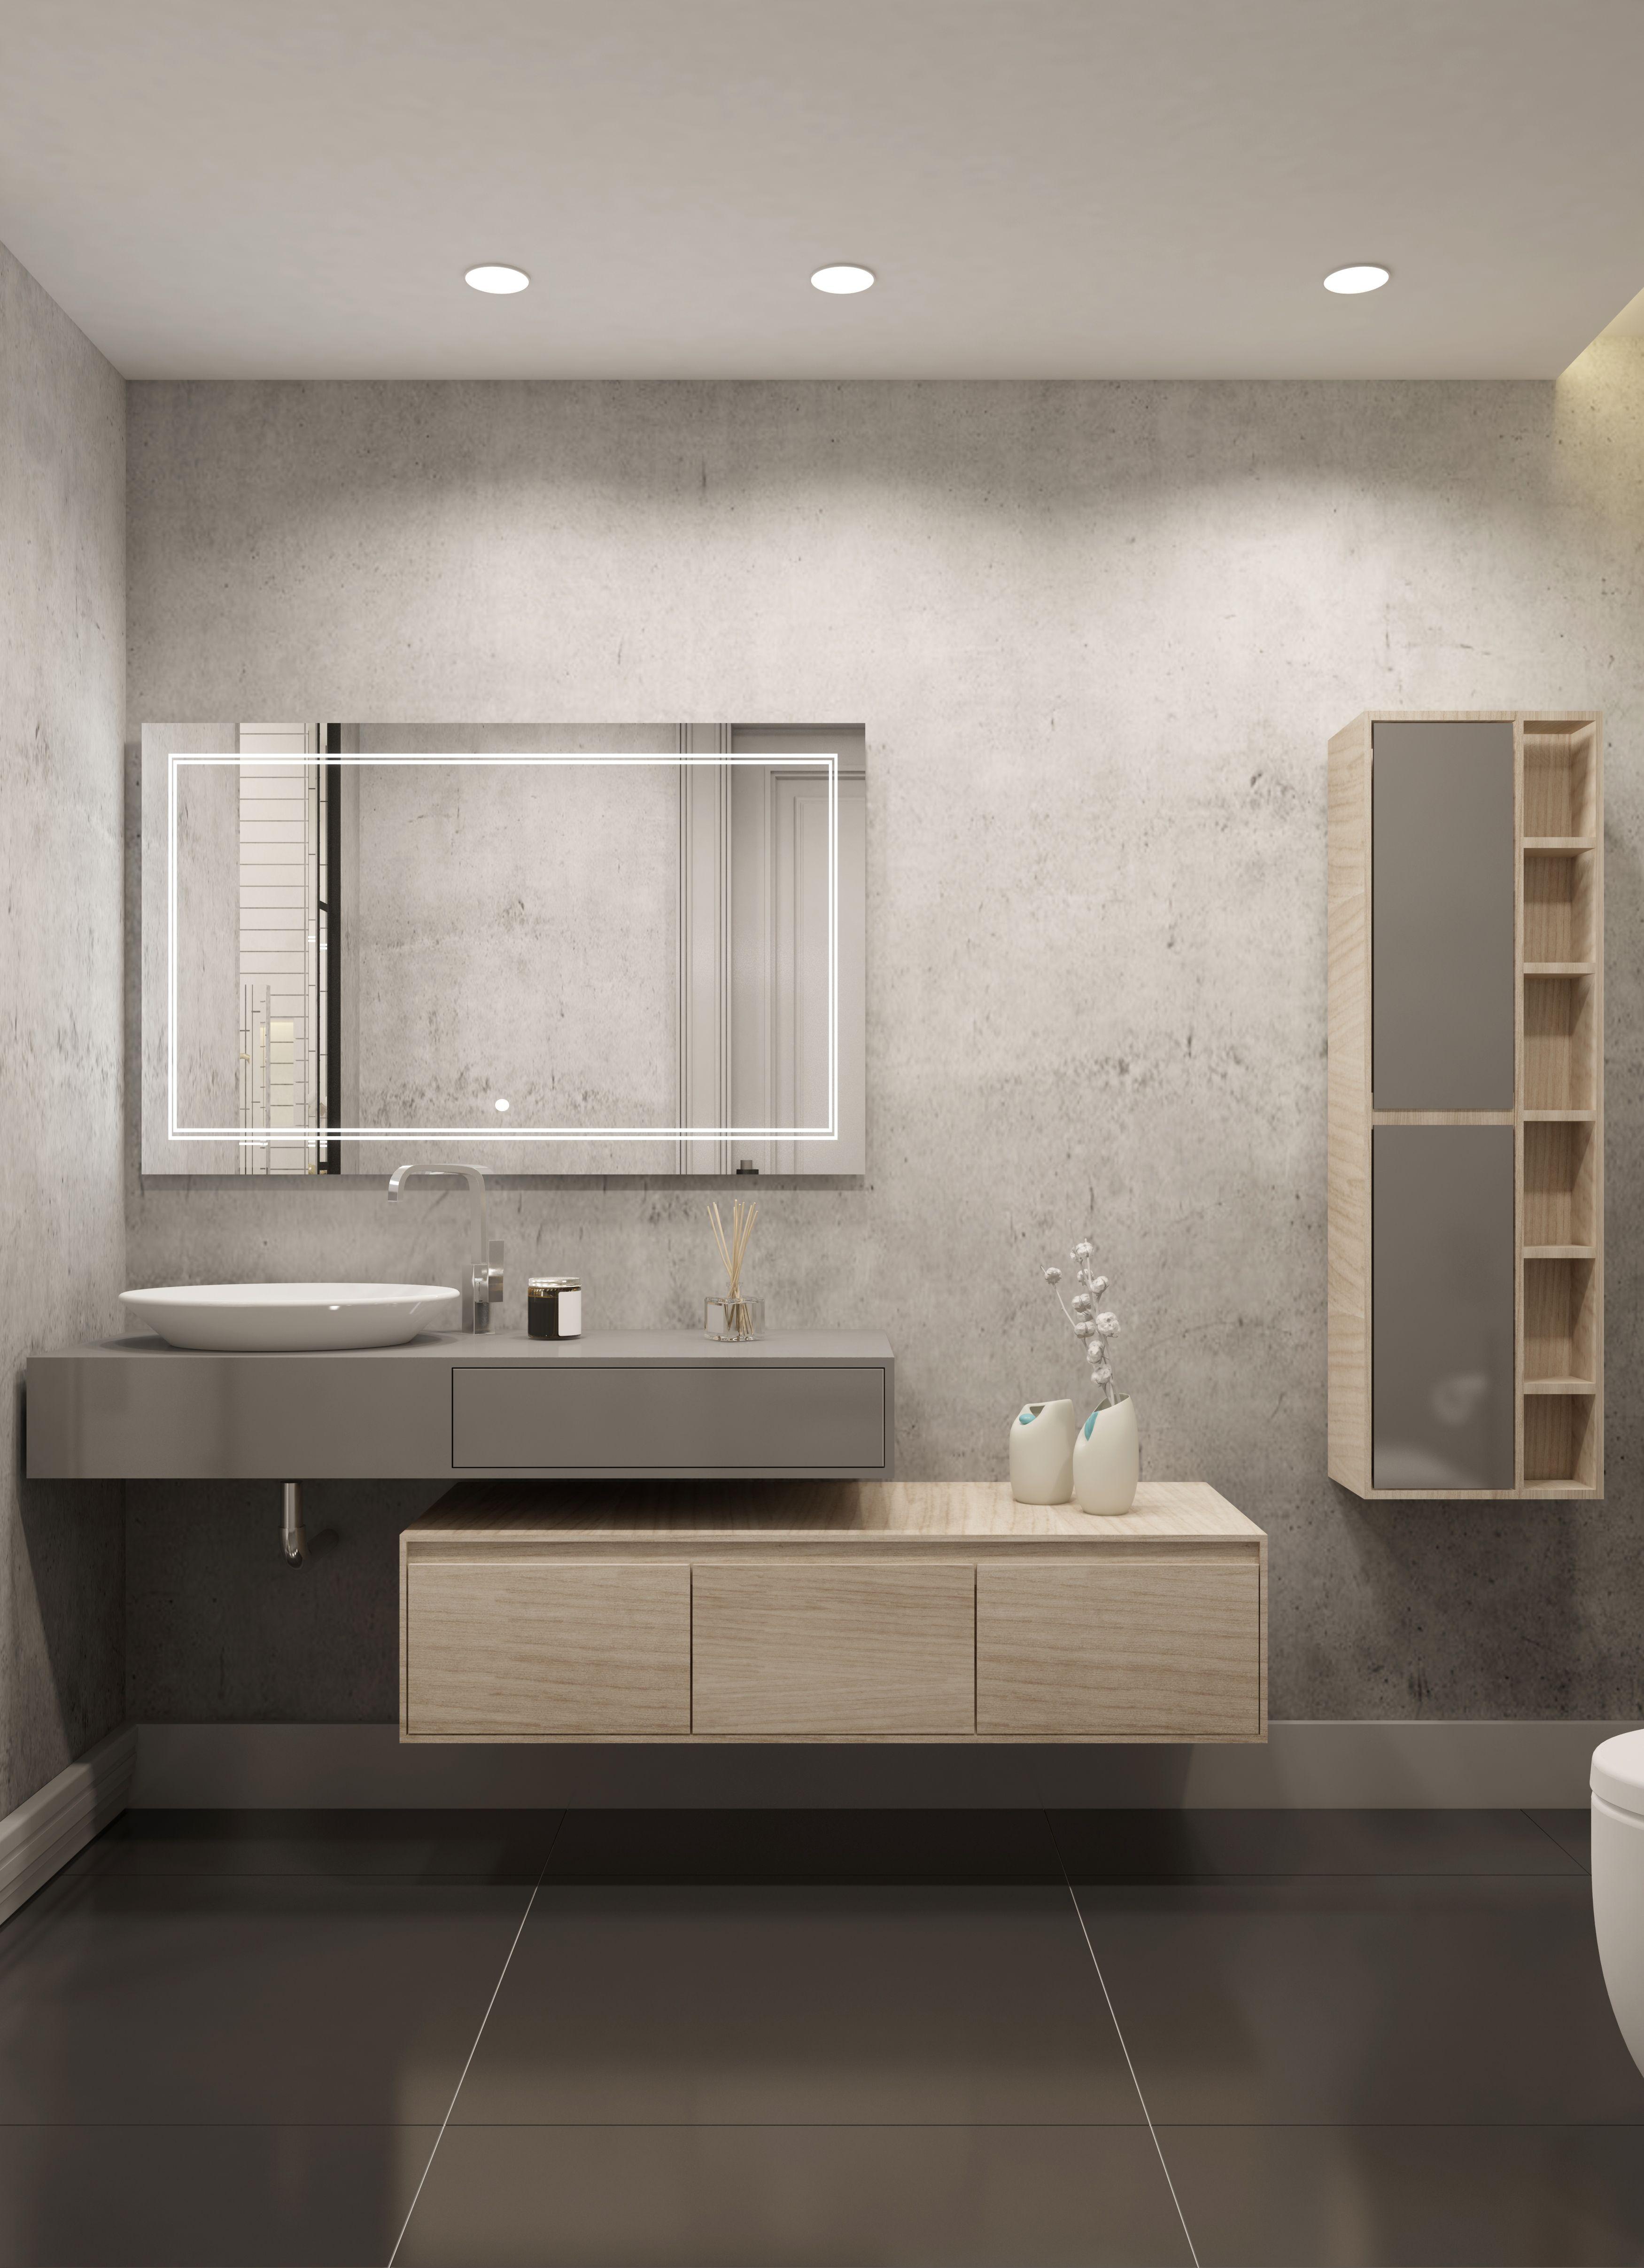 Custom Bathroom Vanities Home Design Outlet Center Blog Custom Bathroom Vanity Bathroom Vanity Bathroom Cabinets Designs